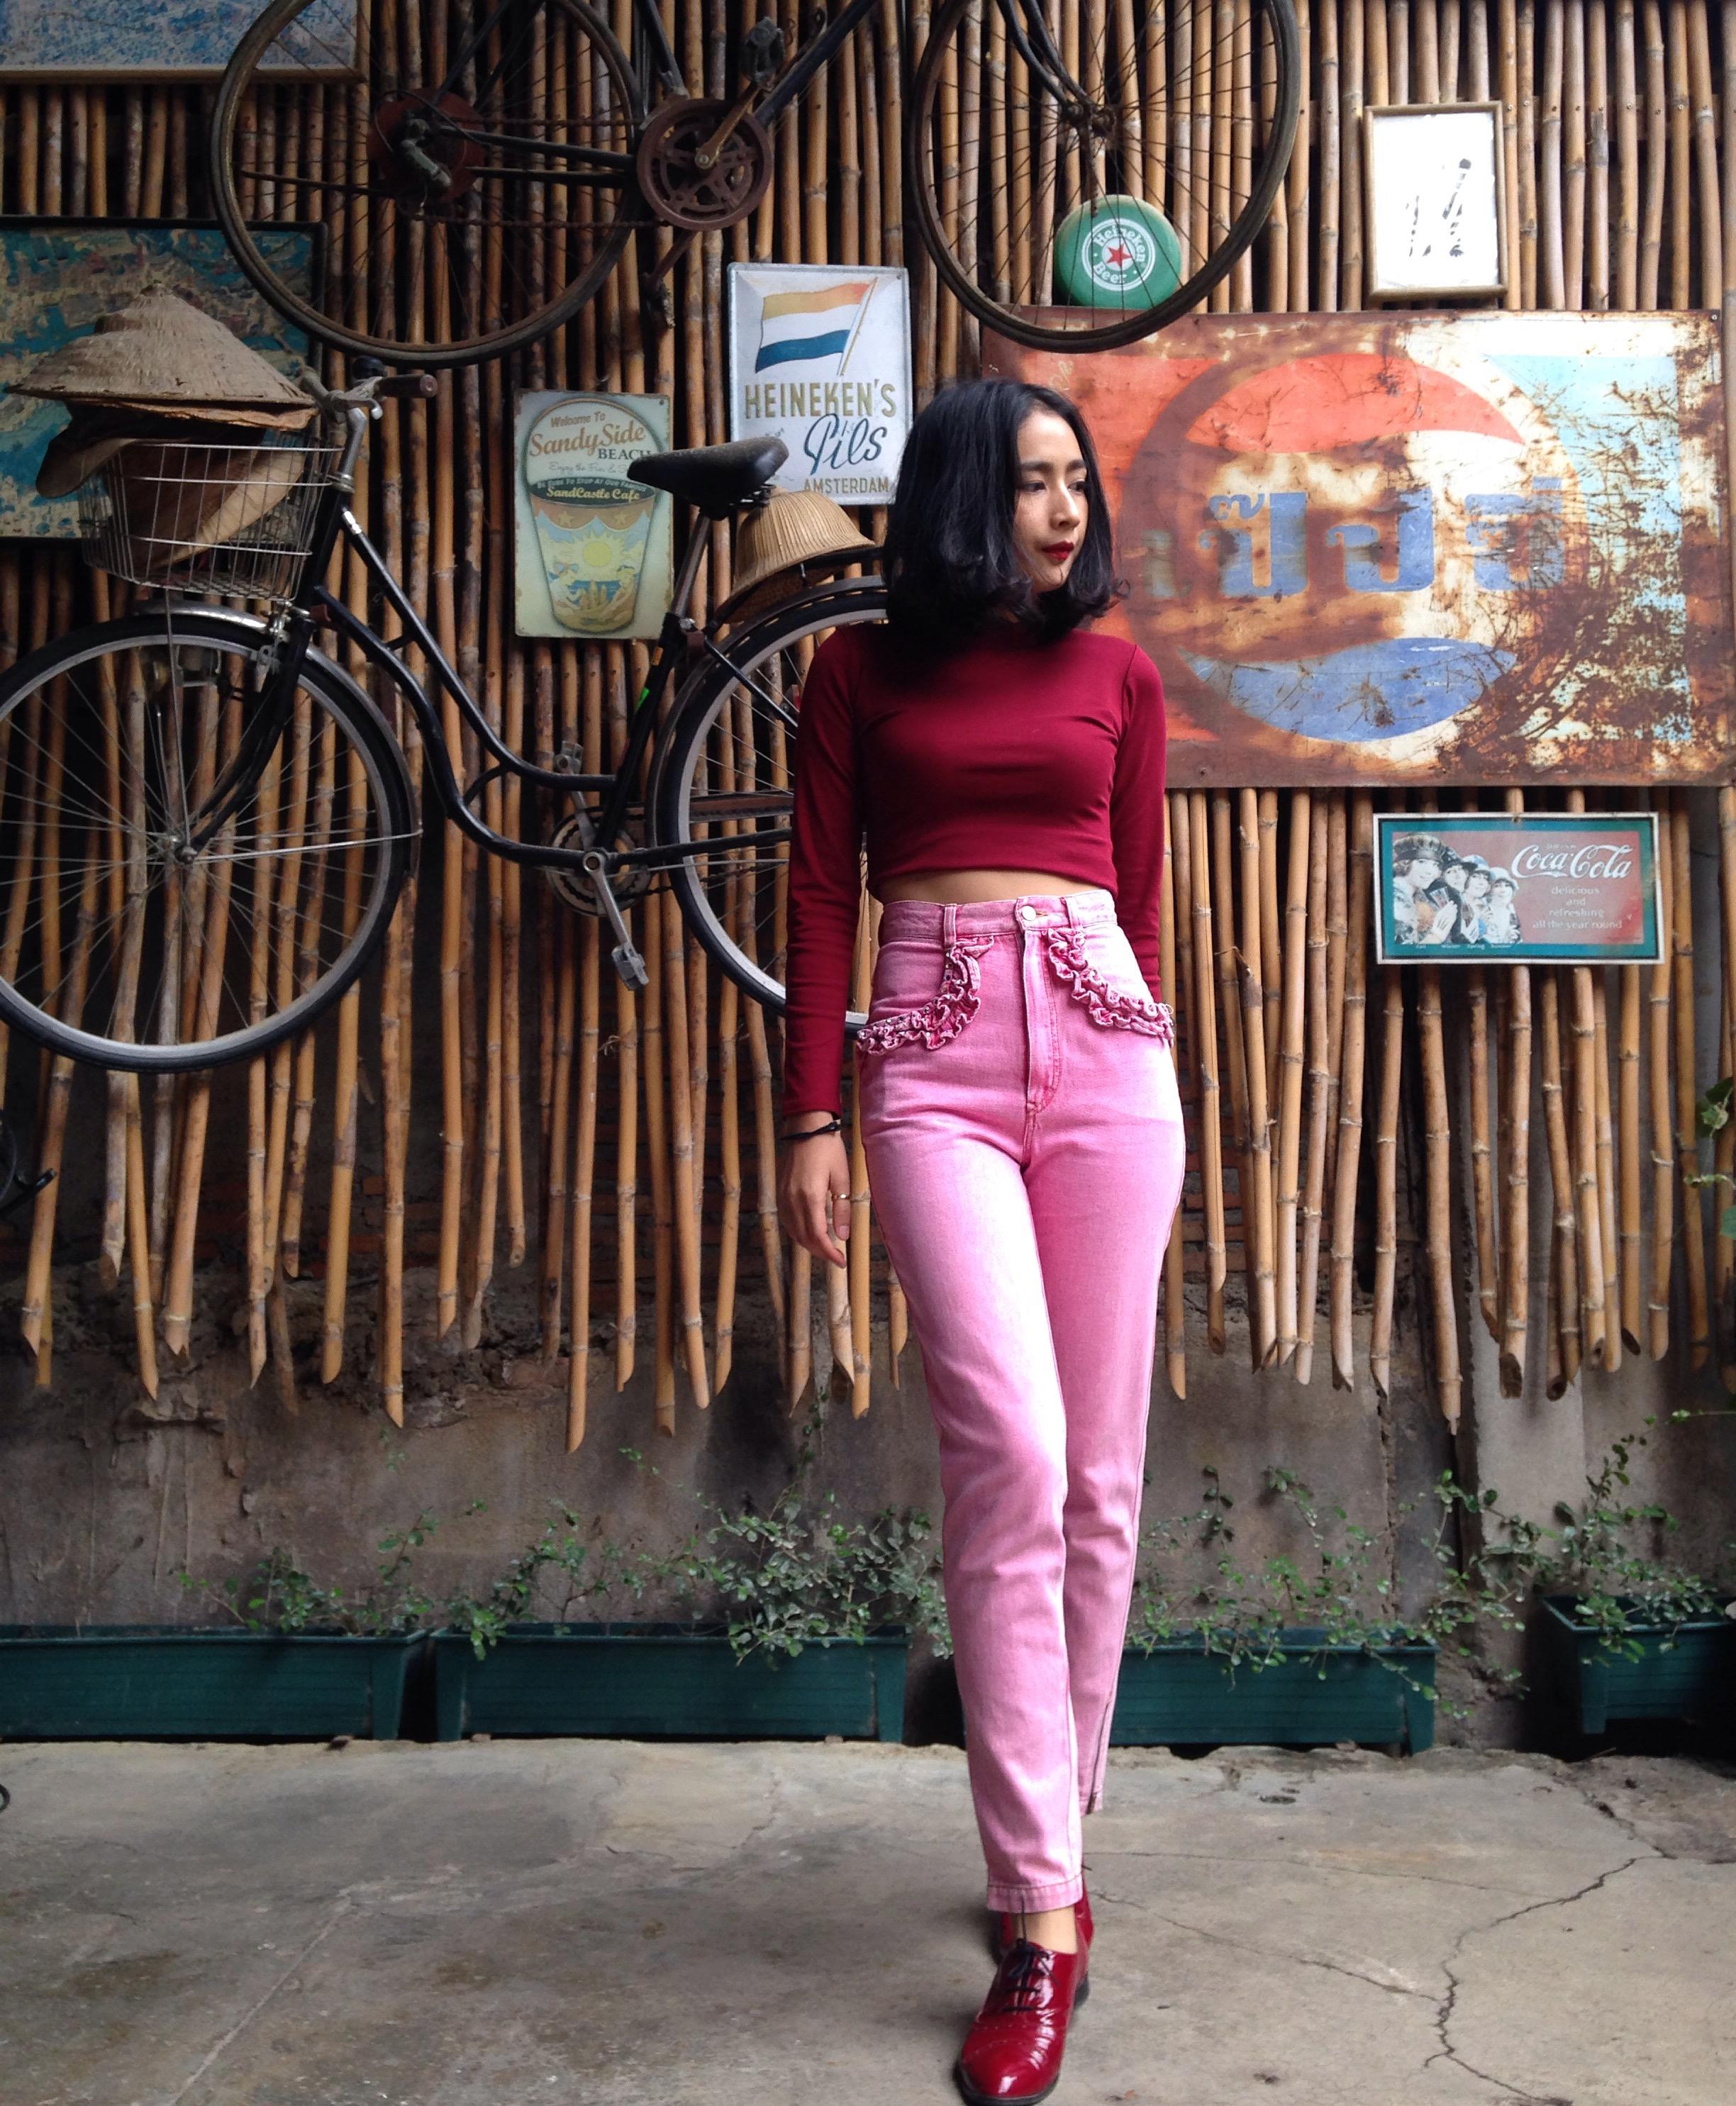 vintage pants : กางเกงยีนส์ขายาวเอวสูง สีชมพู กระเป๋าแต่งระบายหน้า/หลัง ปลายขาติดซิบ เนื้อผ้ายีนส์ไม่ยืด :